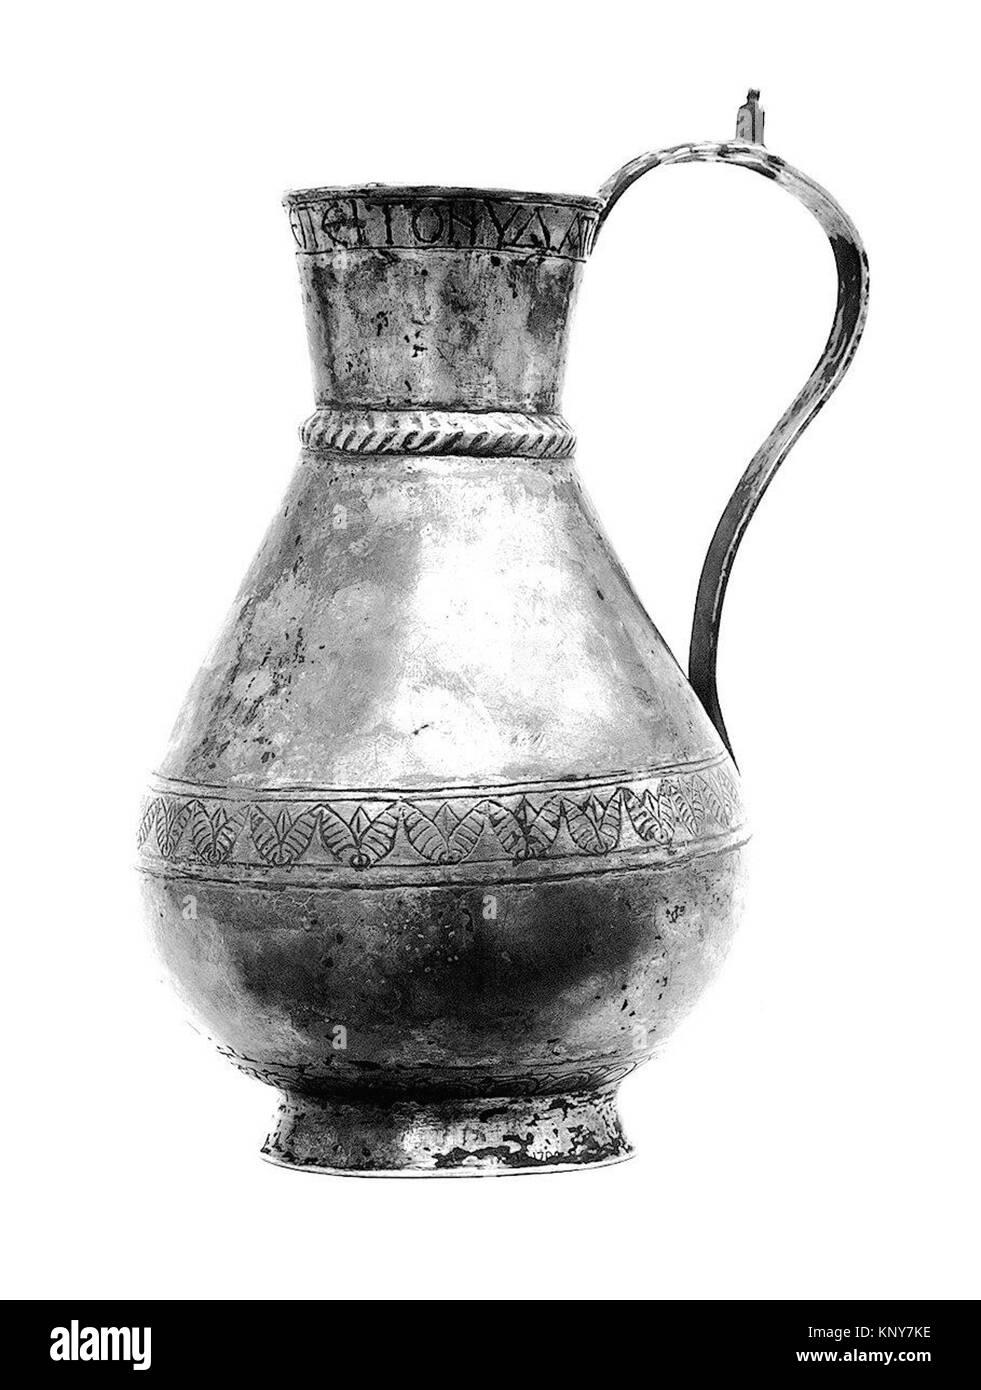 Ewer of Zenobius MET 40786 464113 Avar or Byzantine, Ewer of Zenobius, 700s, Silver, partial-gilt, 9 1/8 ? 5 1/16 - Stock Image